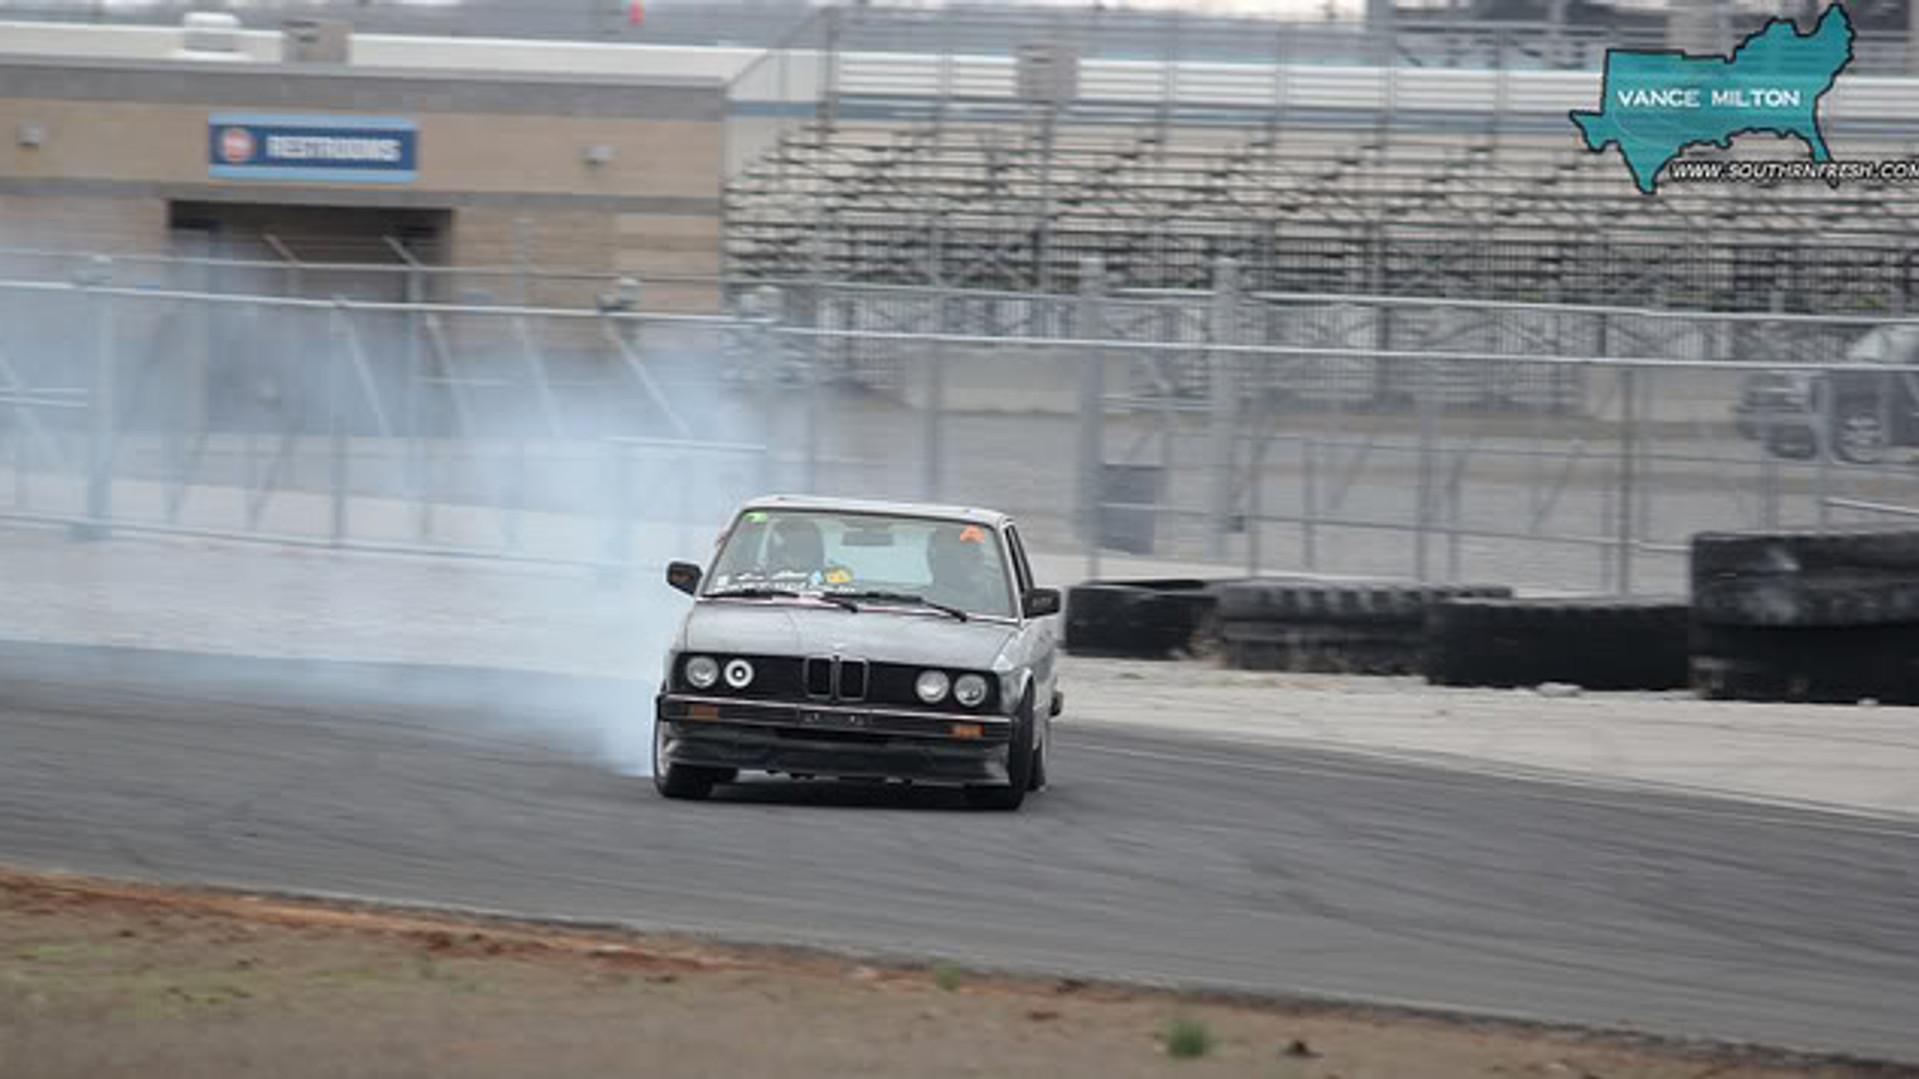 David Drifting 1985 BMW 535i. Nashville Super Speedway